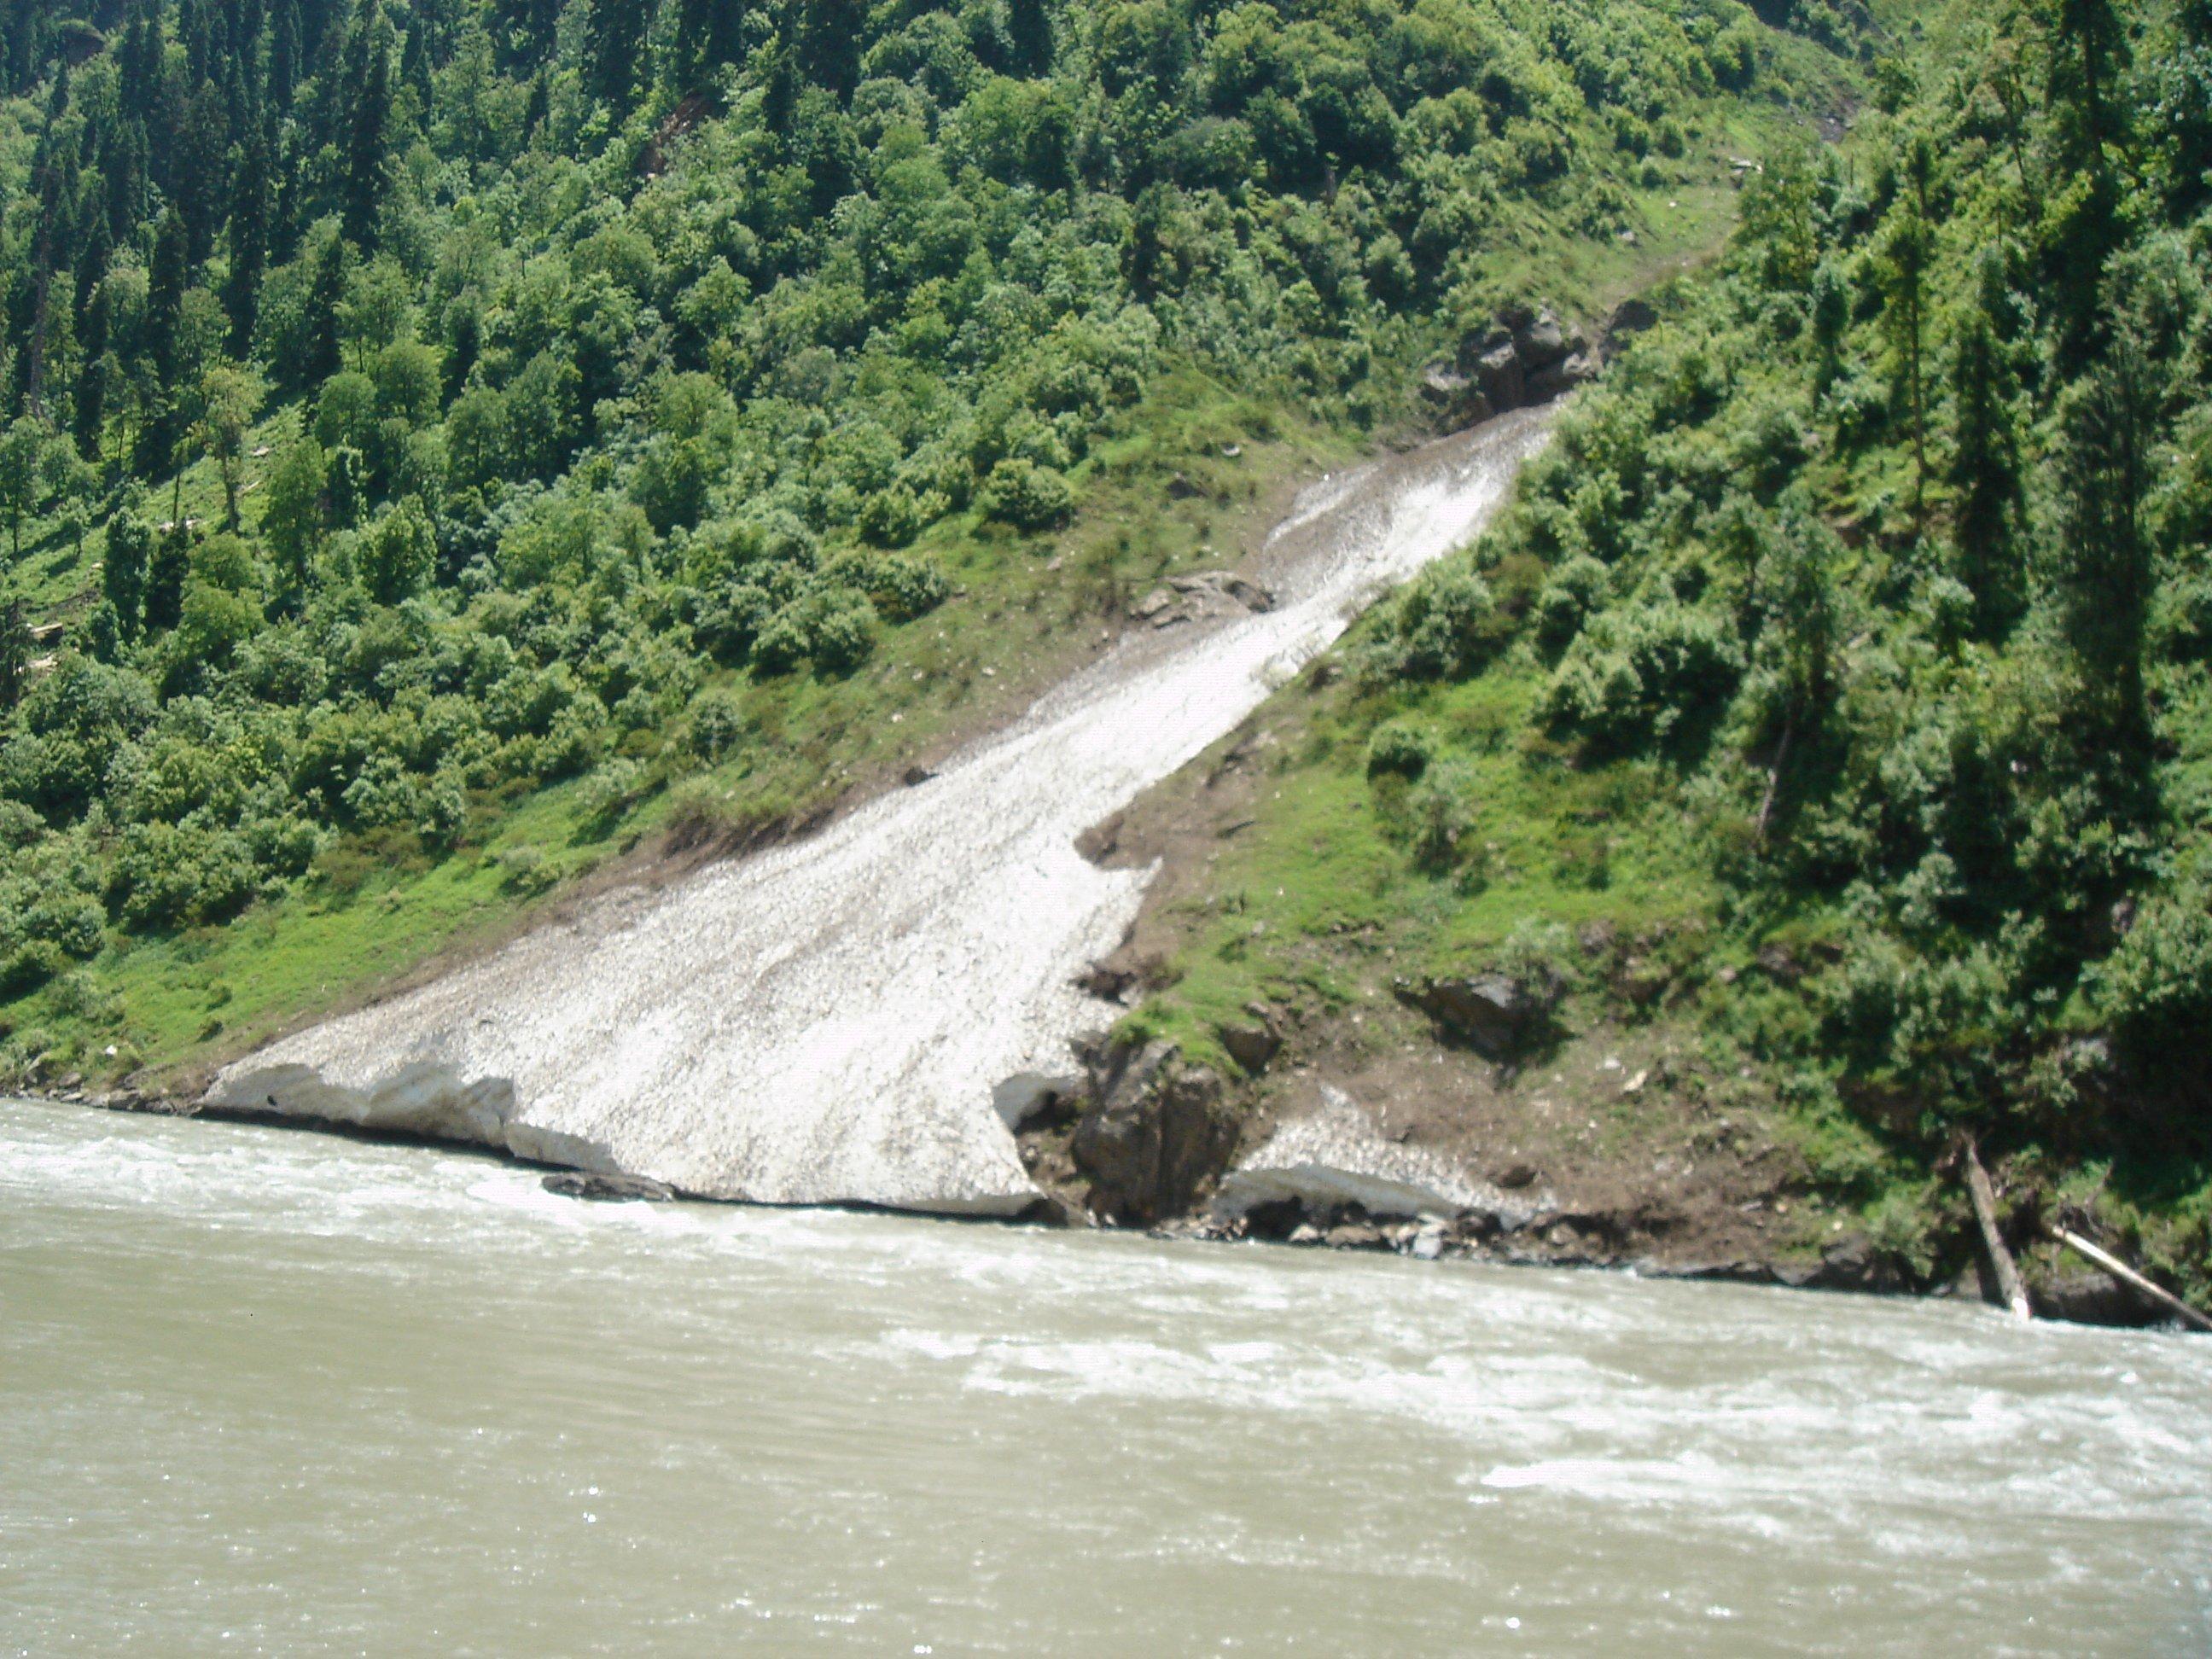 neelum river hd free - photo #9